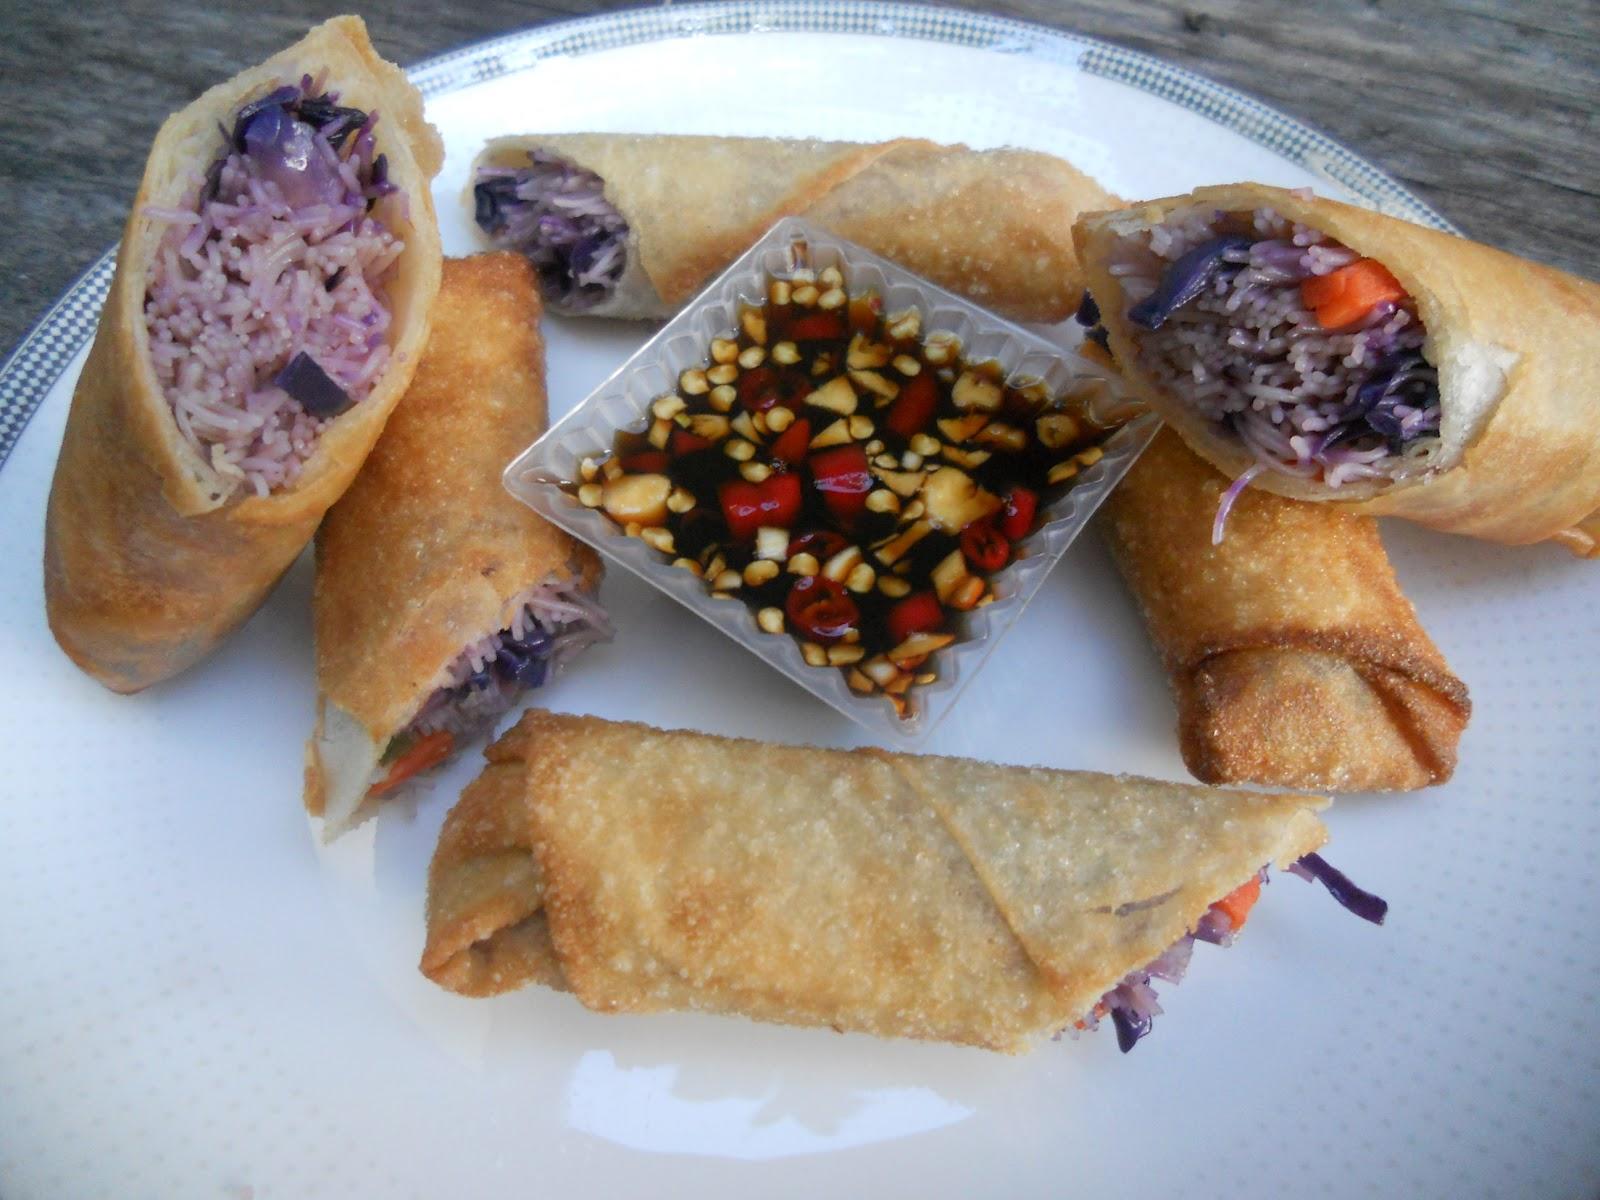 http://4.bp.blogspot.com/-3VUl1CBOz18/T4cbjaALZjI/AAAAAAAAAvs/IXoZmj81FgQ/s1600/food+2012+195.jpg